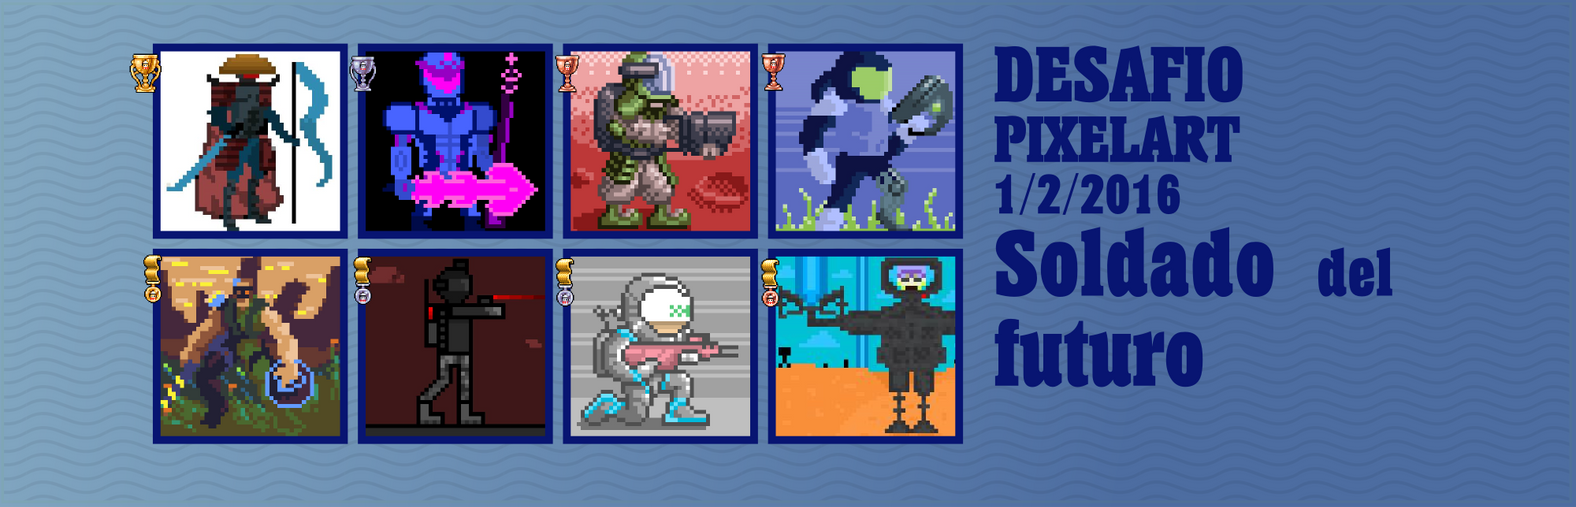 Desafio pixelart 1/2/2015 Soldado del futuro. by Christian223